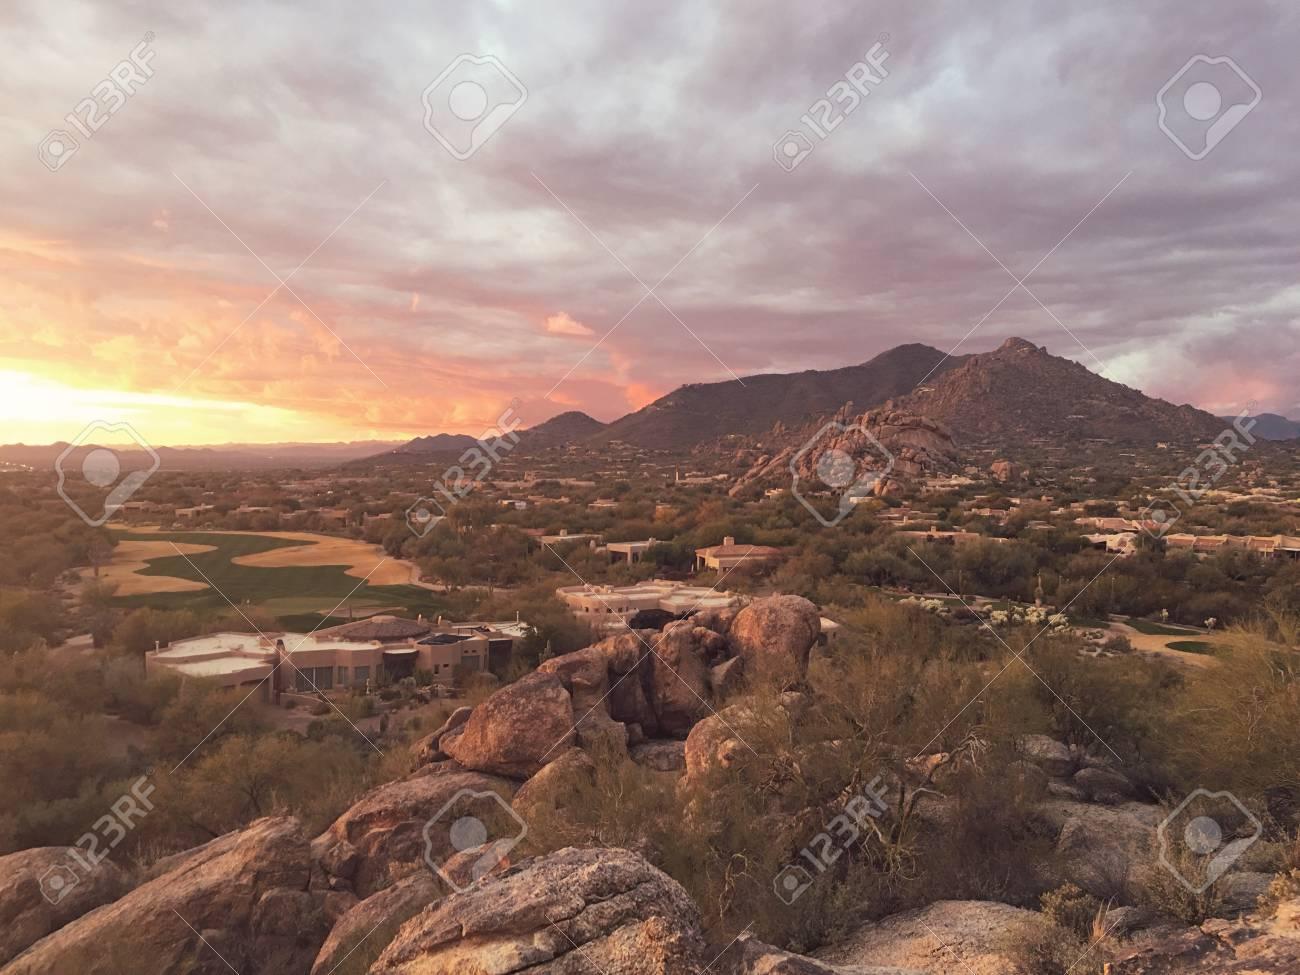 scottsdale arizona desert landscape